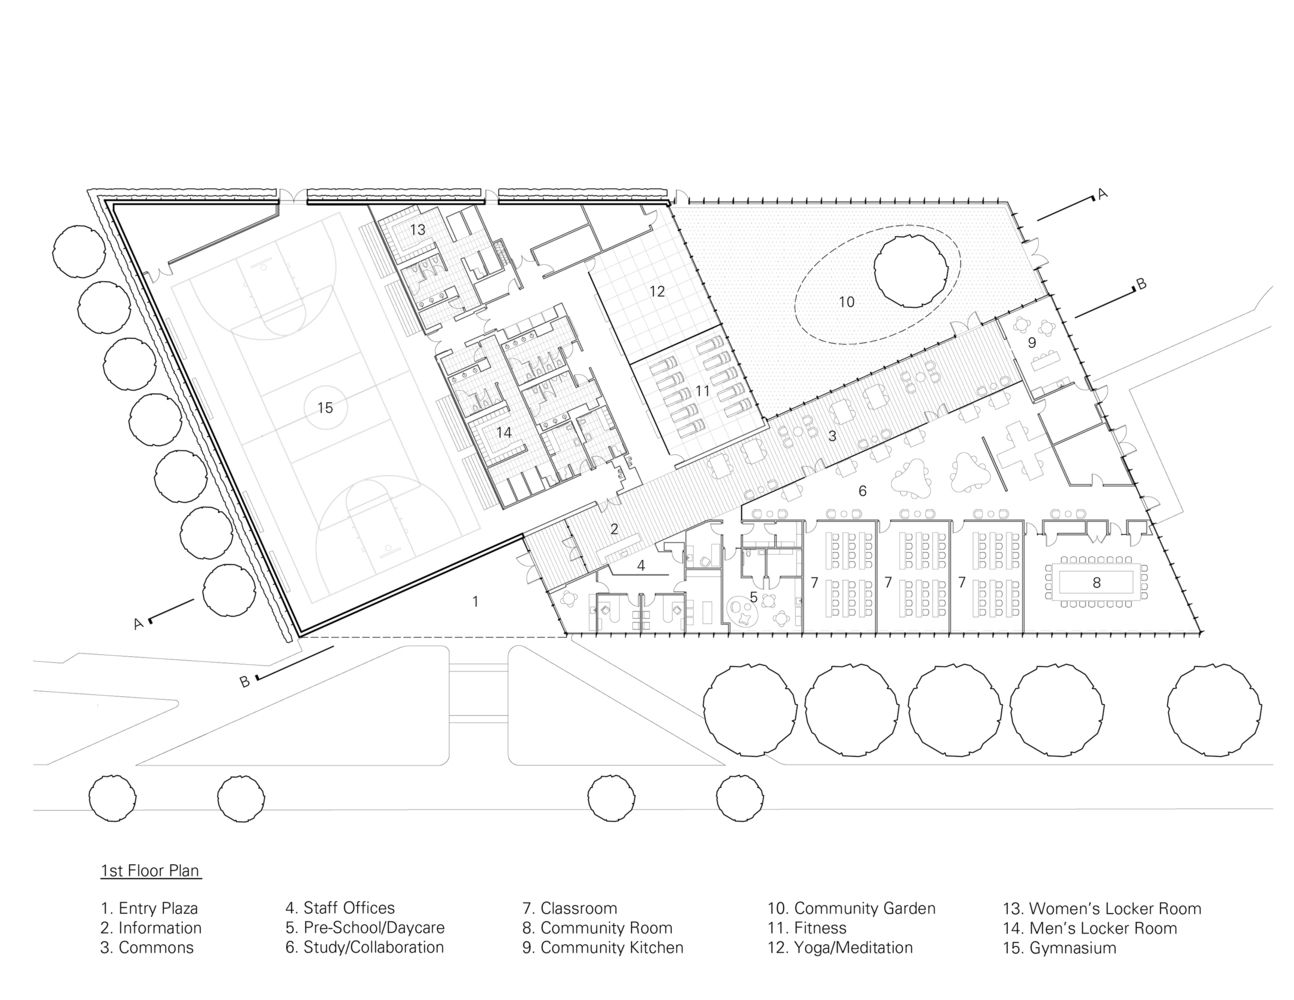 Gallery Of Trec Newark Housing Authority Ikon 5 Architects 12 Education Center How To Plan Architect